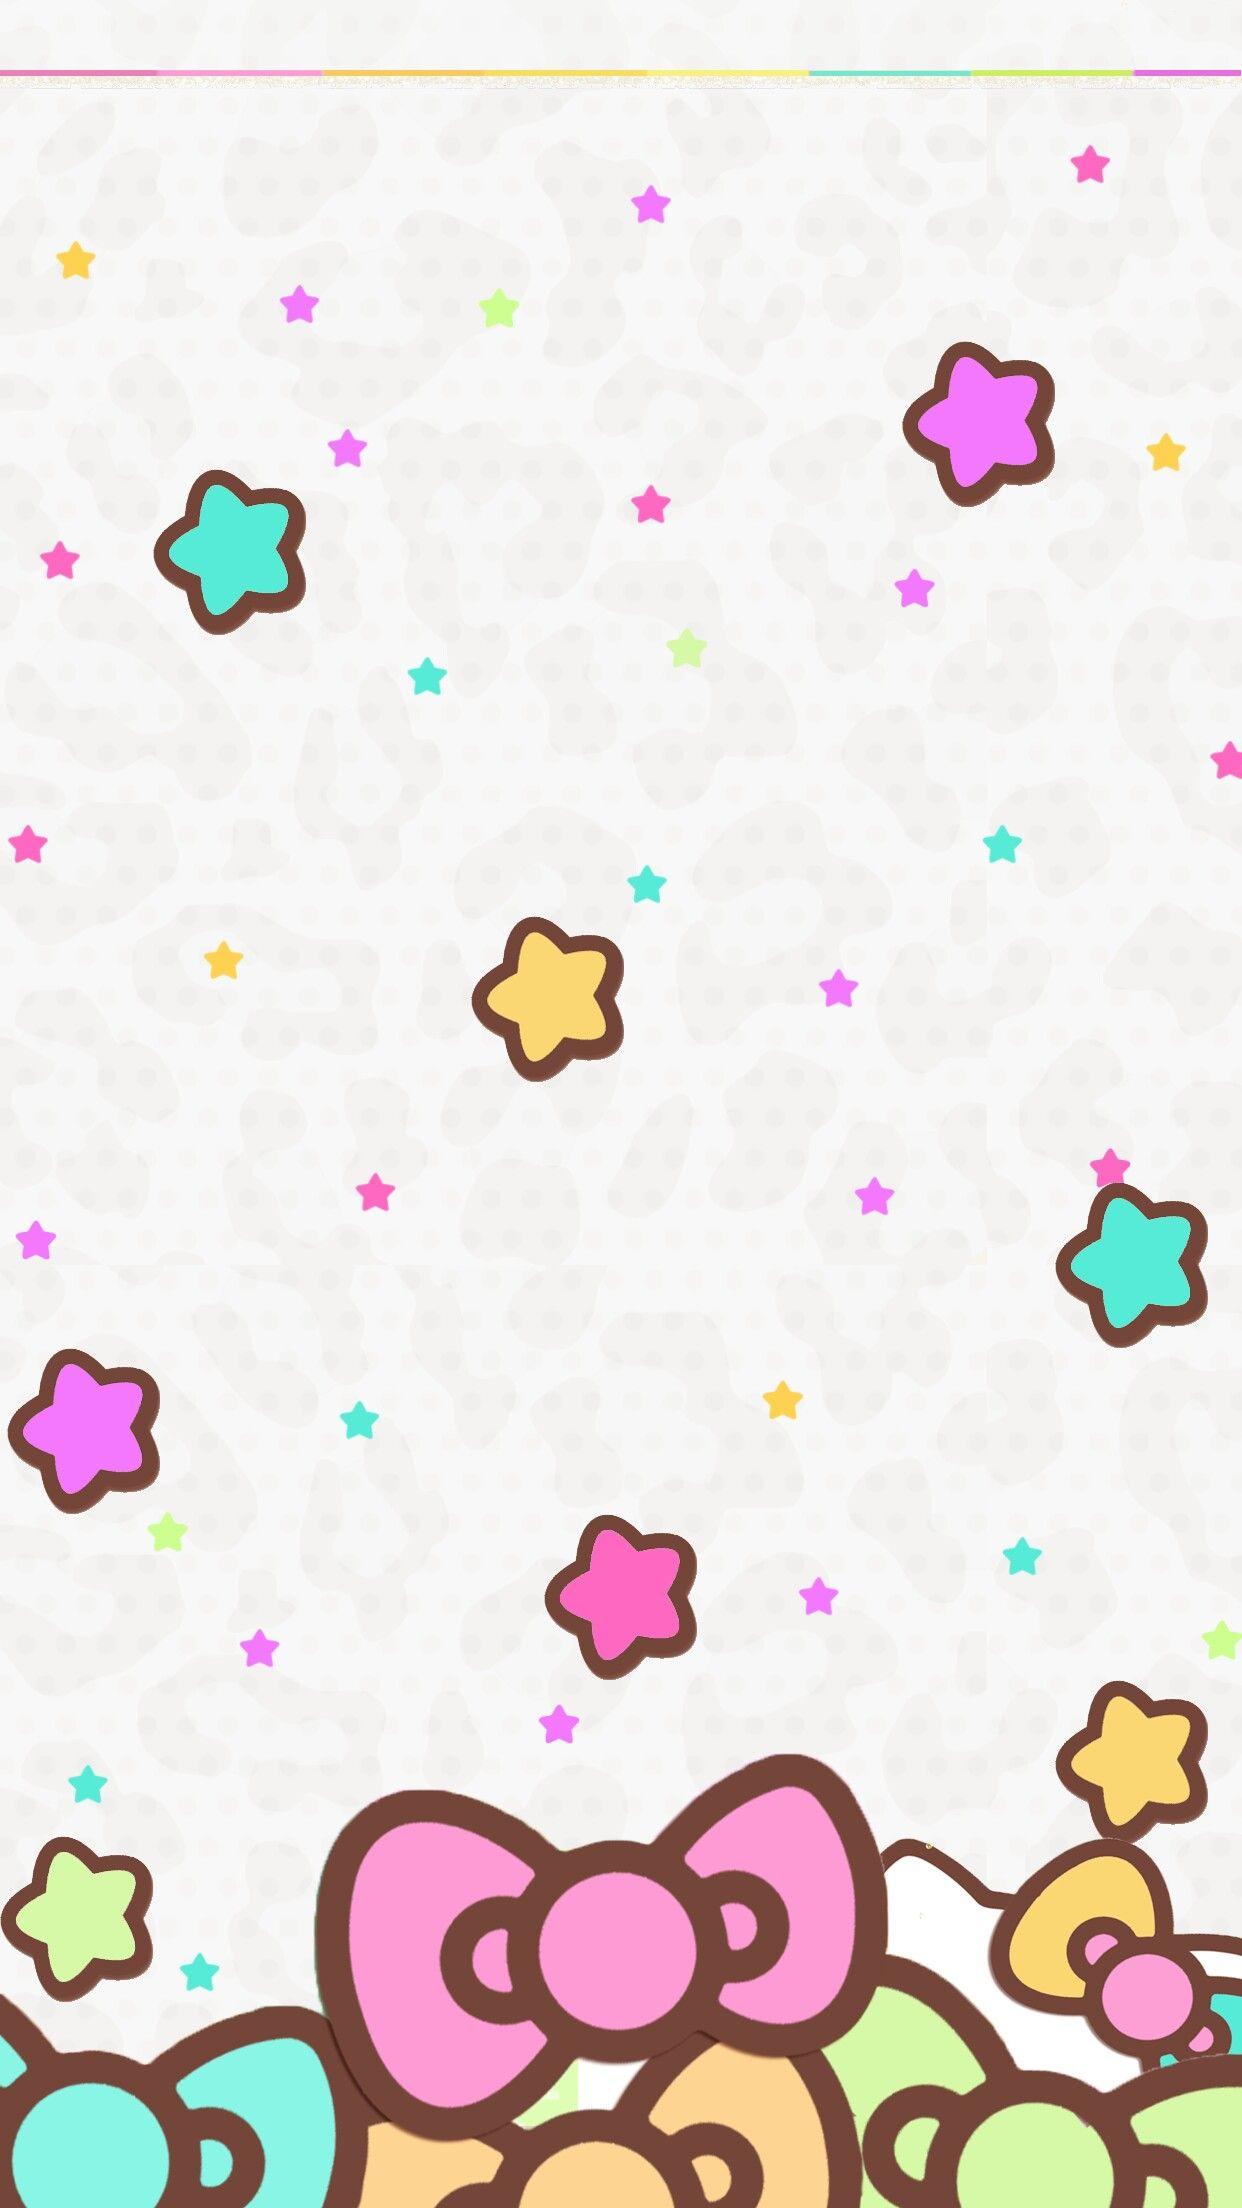 Download Wallpaper Hello Kitty Wall - 9fb27bd51e0c1847c27cd12022c62a5a  Snapshot_869573.jpg